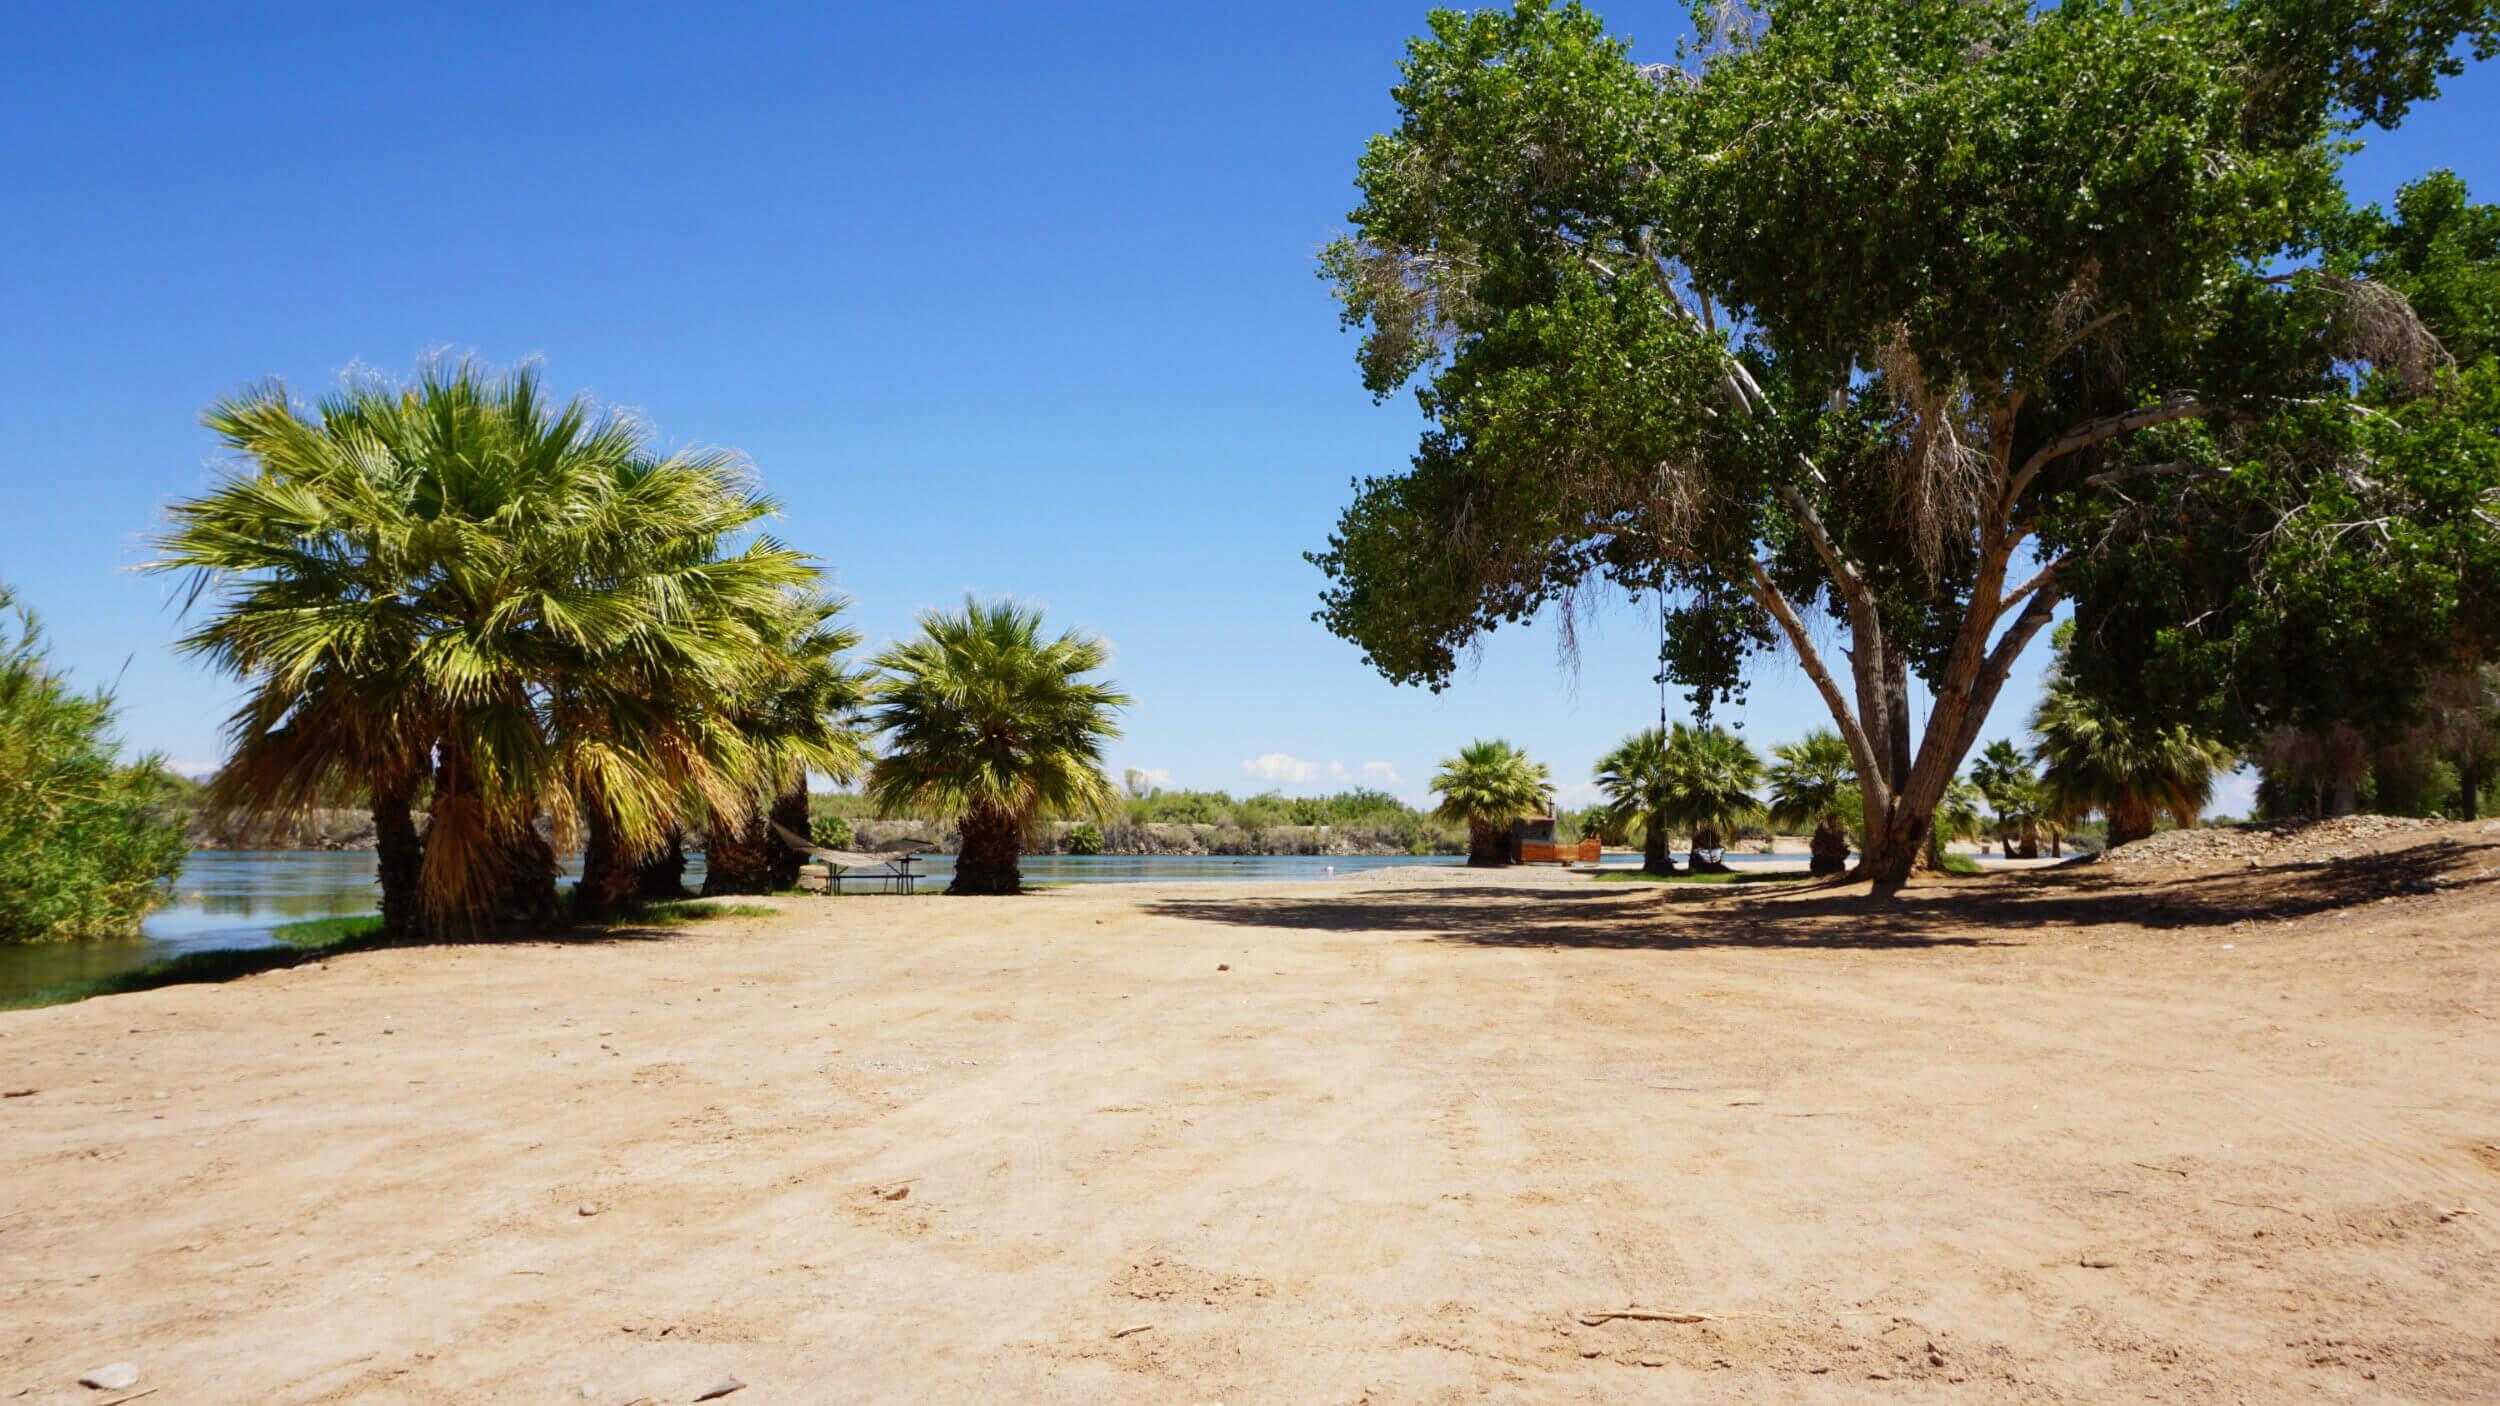 beach-arizona-oasis.jpg